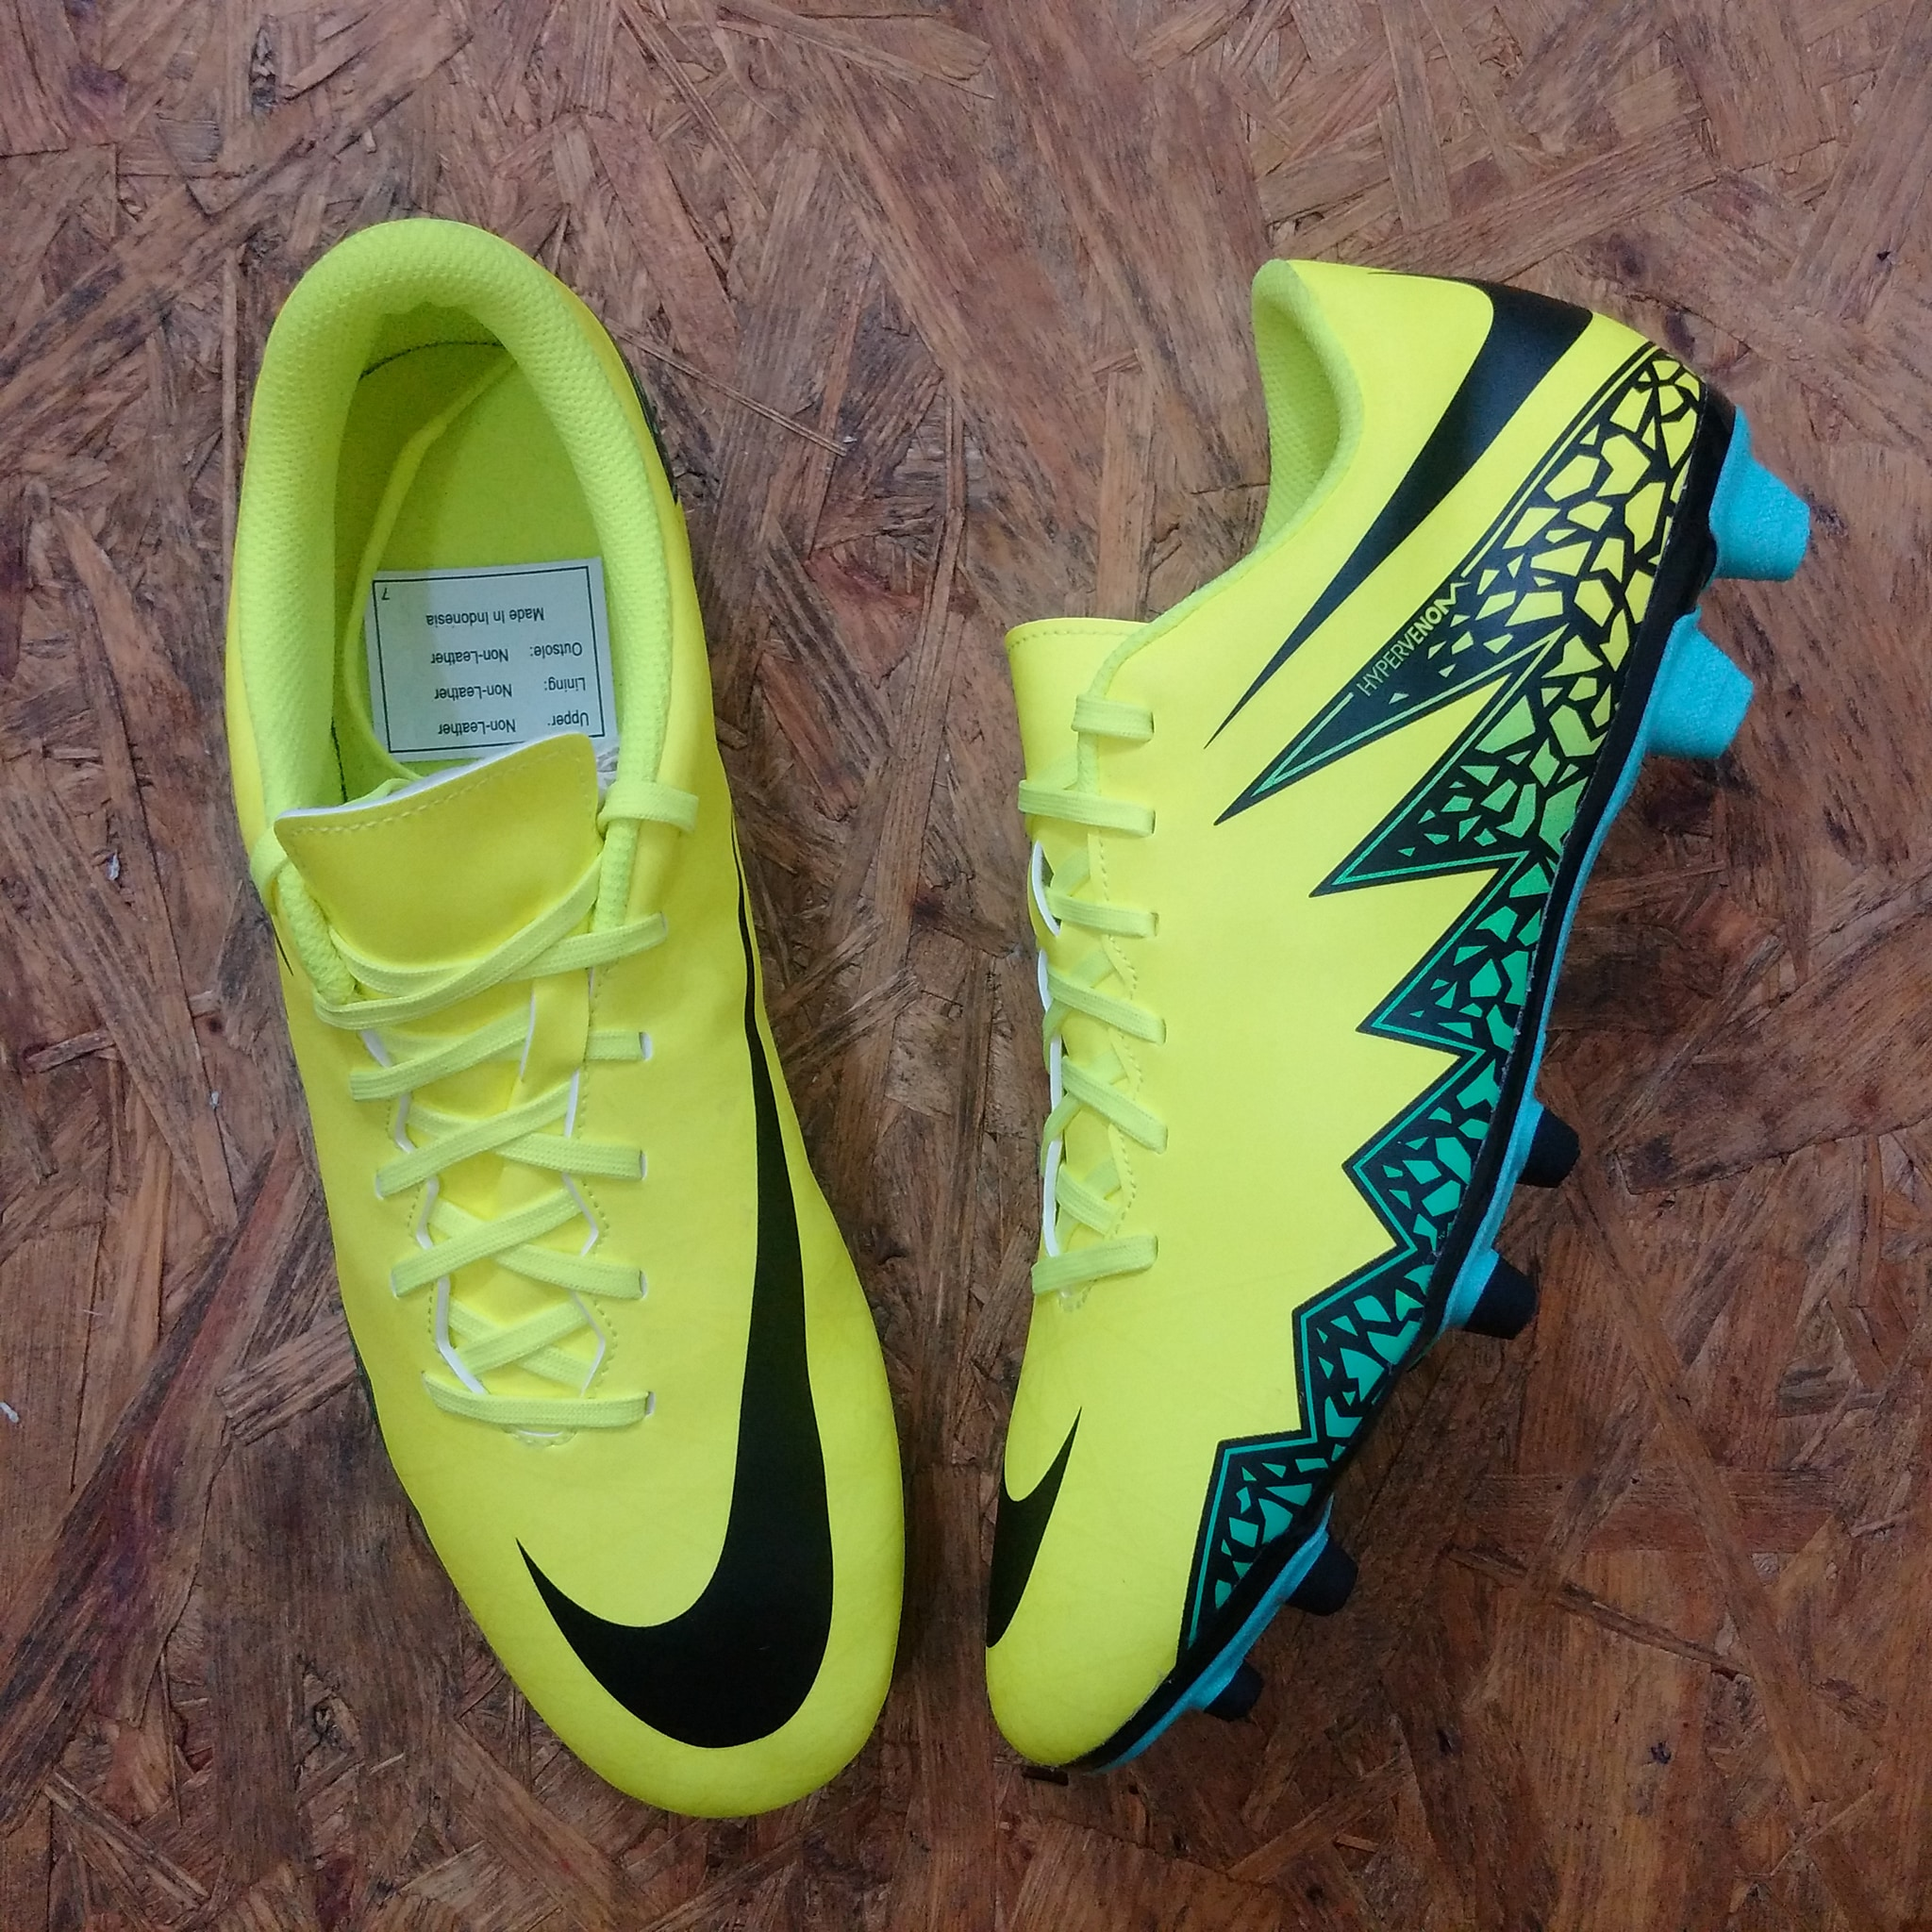 Harga Nike Hypervenom Indonesia Sepatu Futsal Phelon Ii Ic 749898 703 Hijau Bola Original Made In